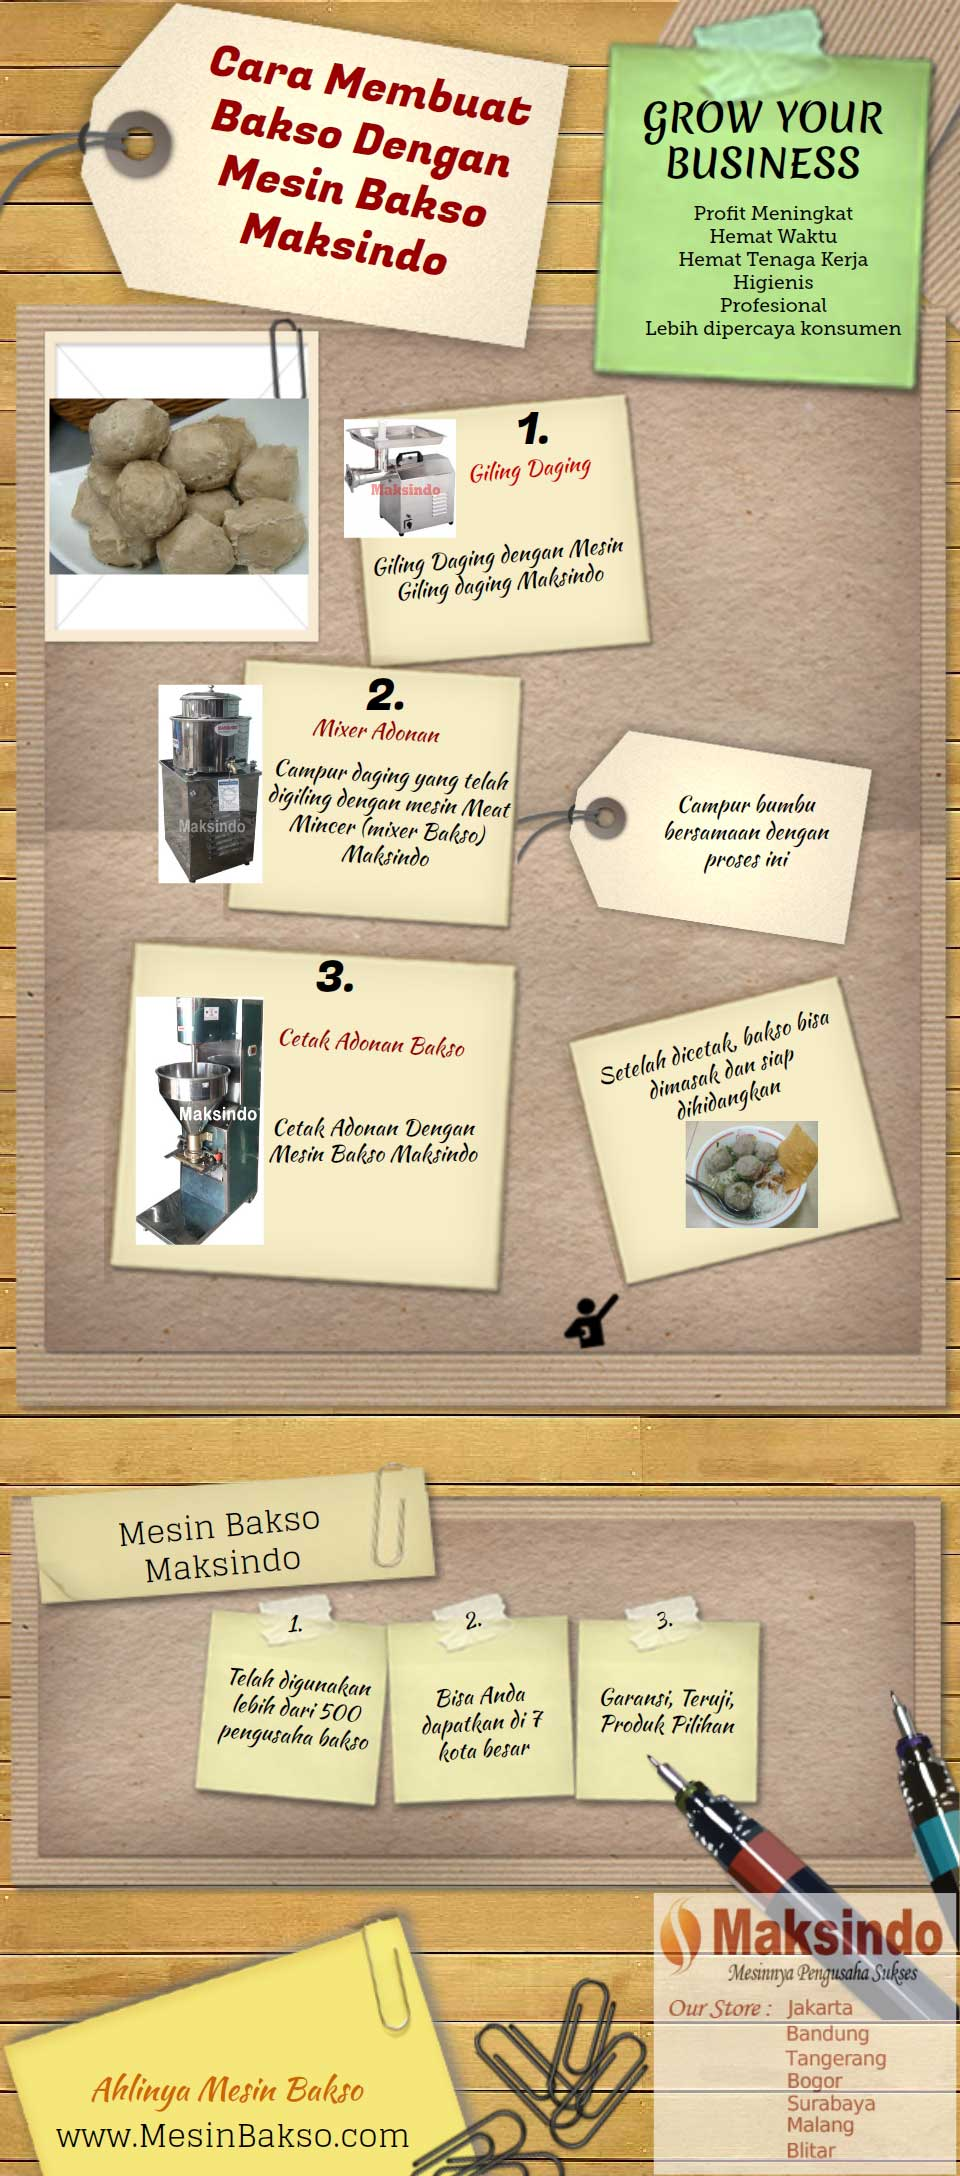 cara membuat bakso dengan mesin Cara Membuat Bakso dengan Mesin Bakso Maksindo